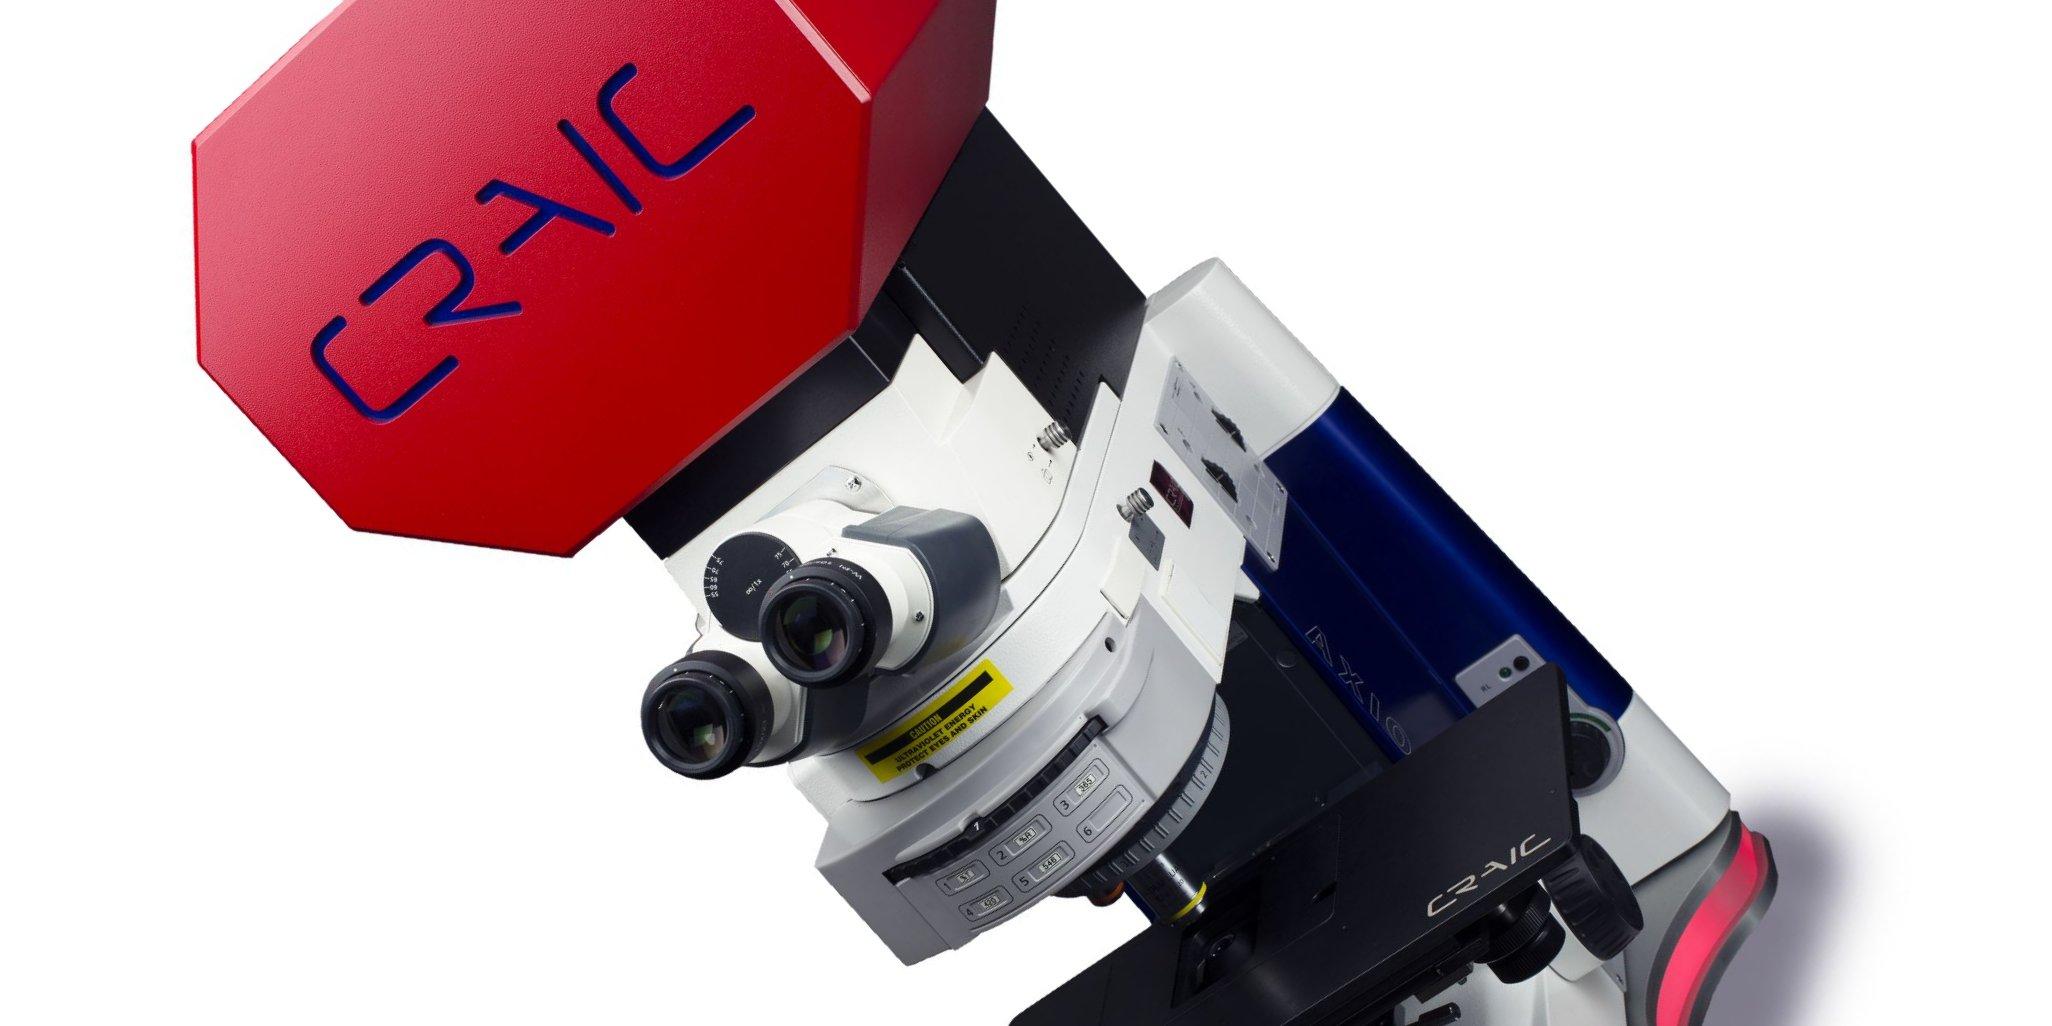 CRAIC Microspectrophotmeter